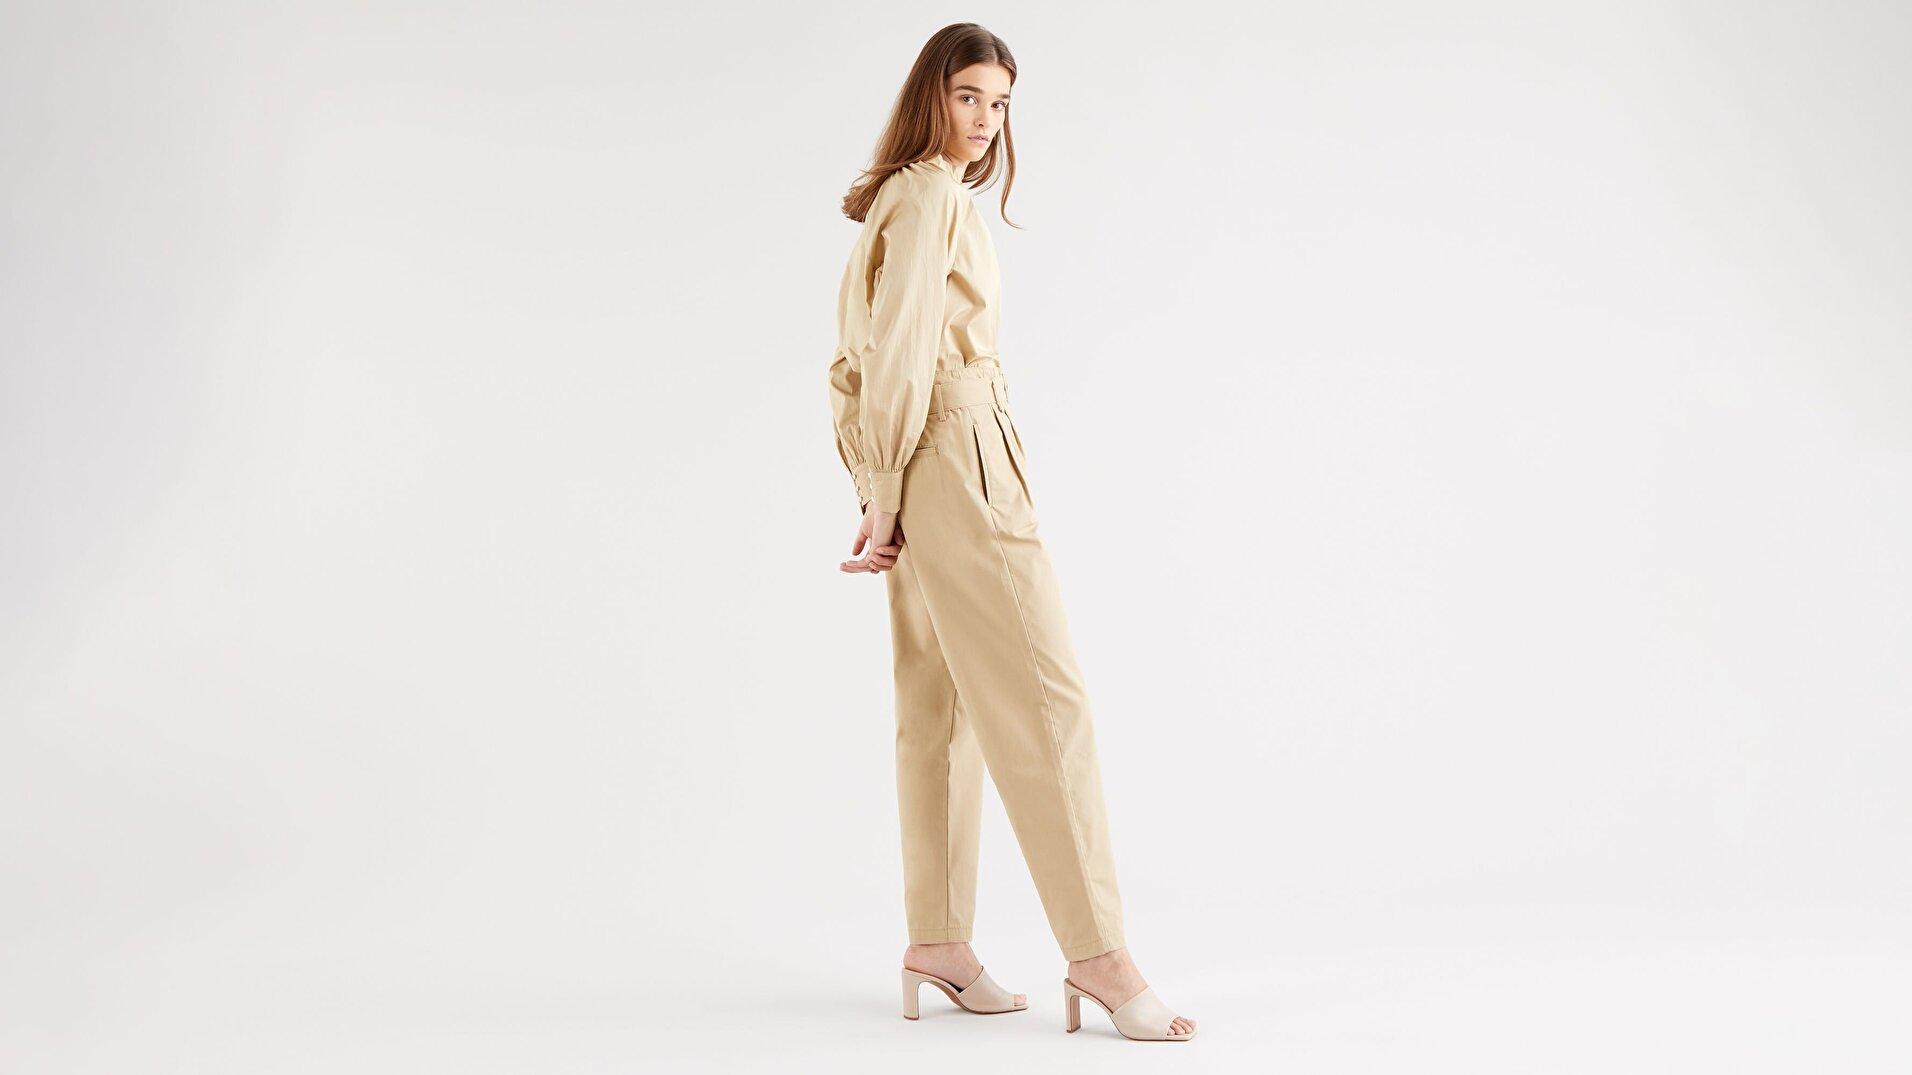 Tailor Yüksek Bel Taper Kadın Jean Pantolon-Soft Structure Incense